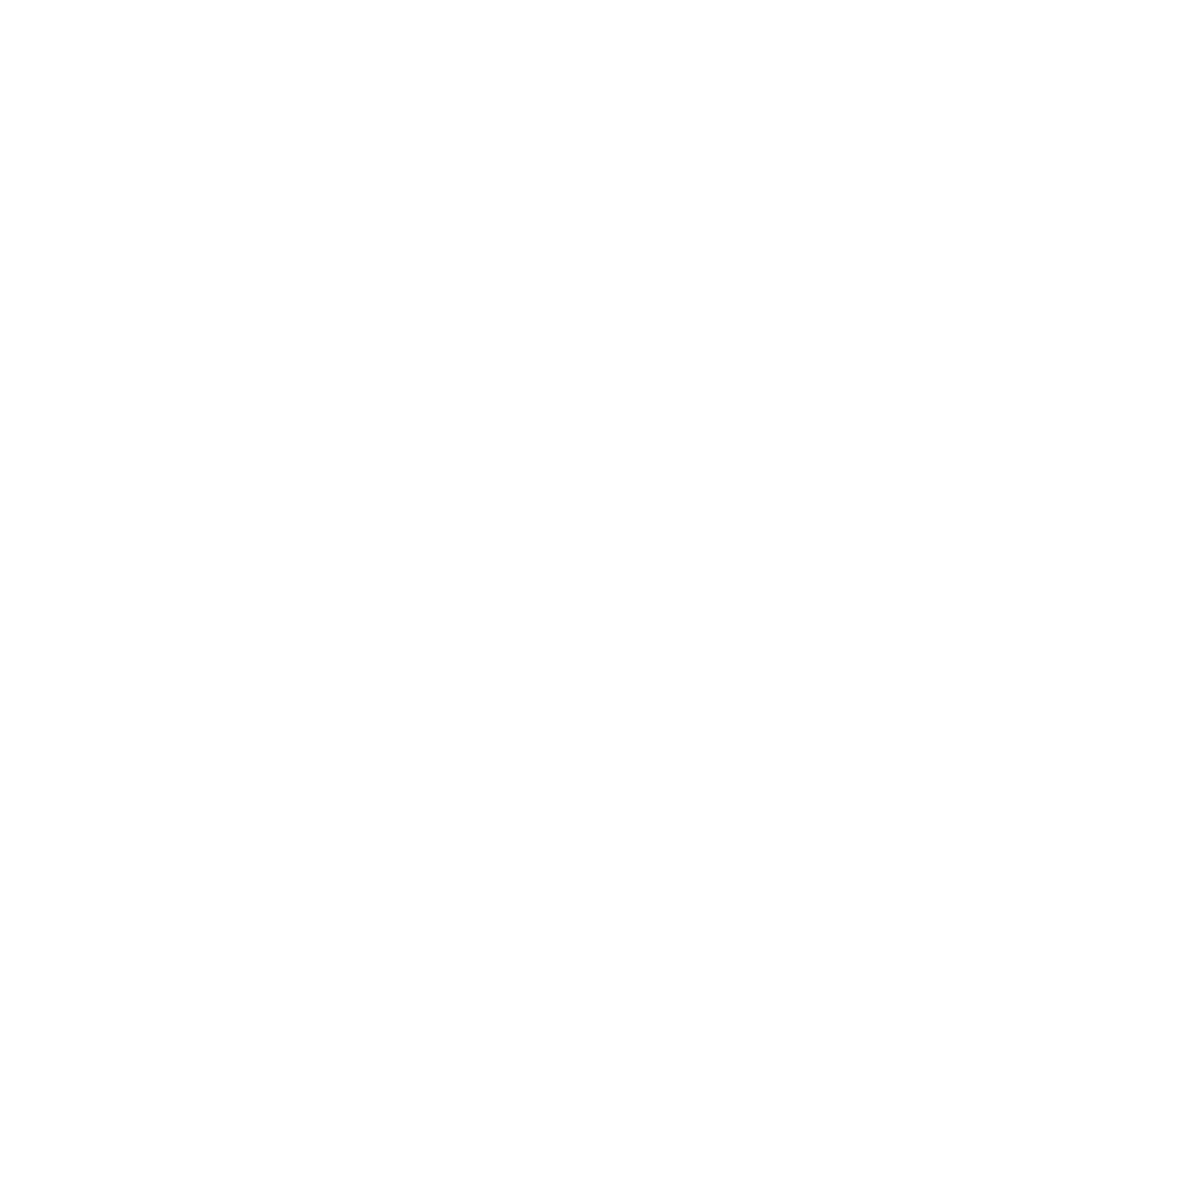 Login roblox 123hjemmesidedk Menadzer mali